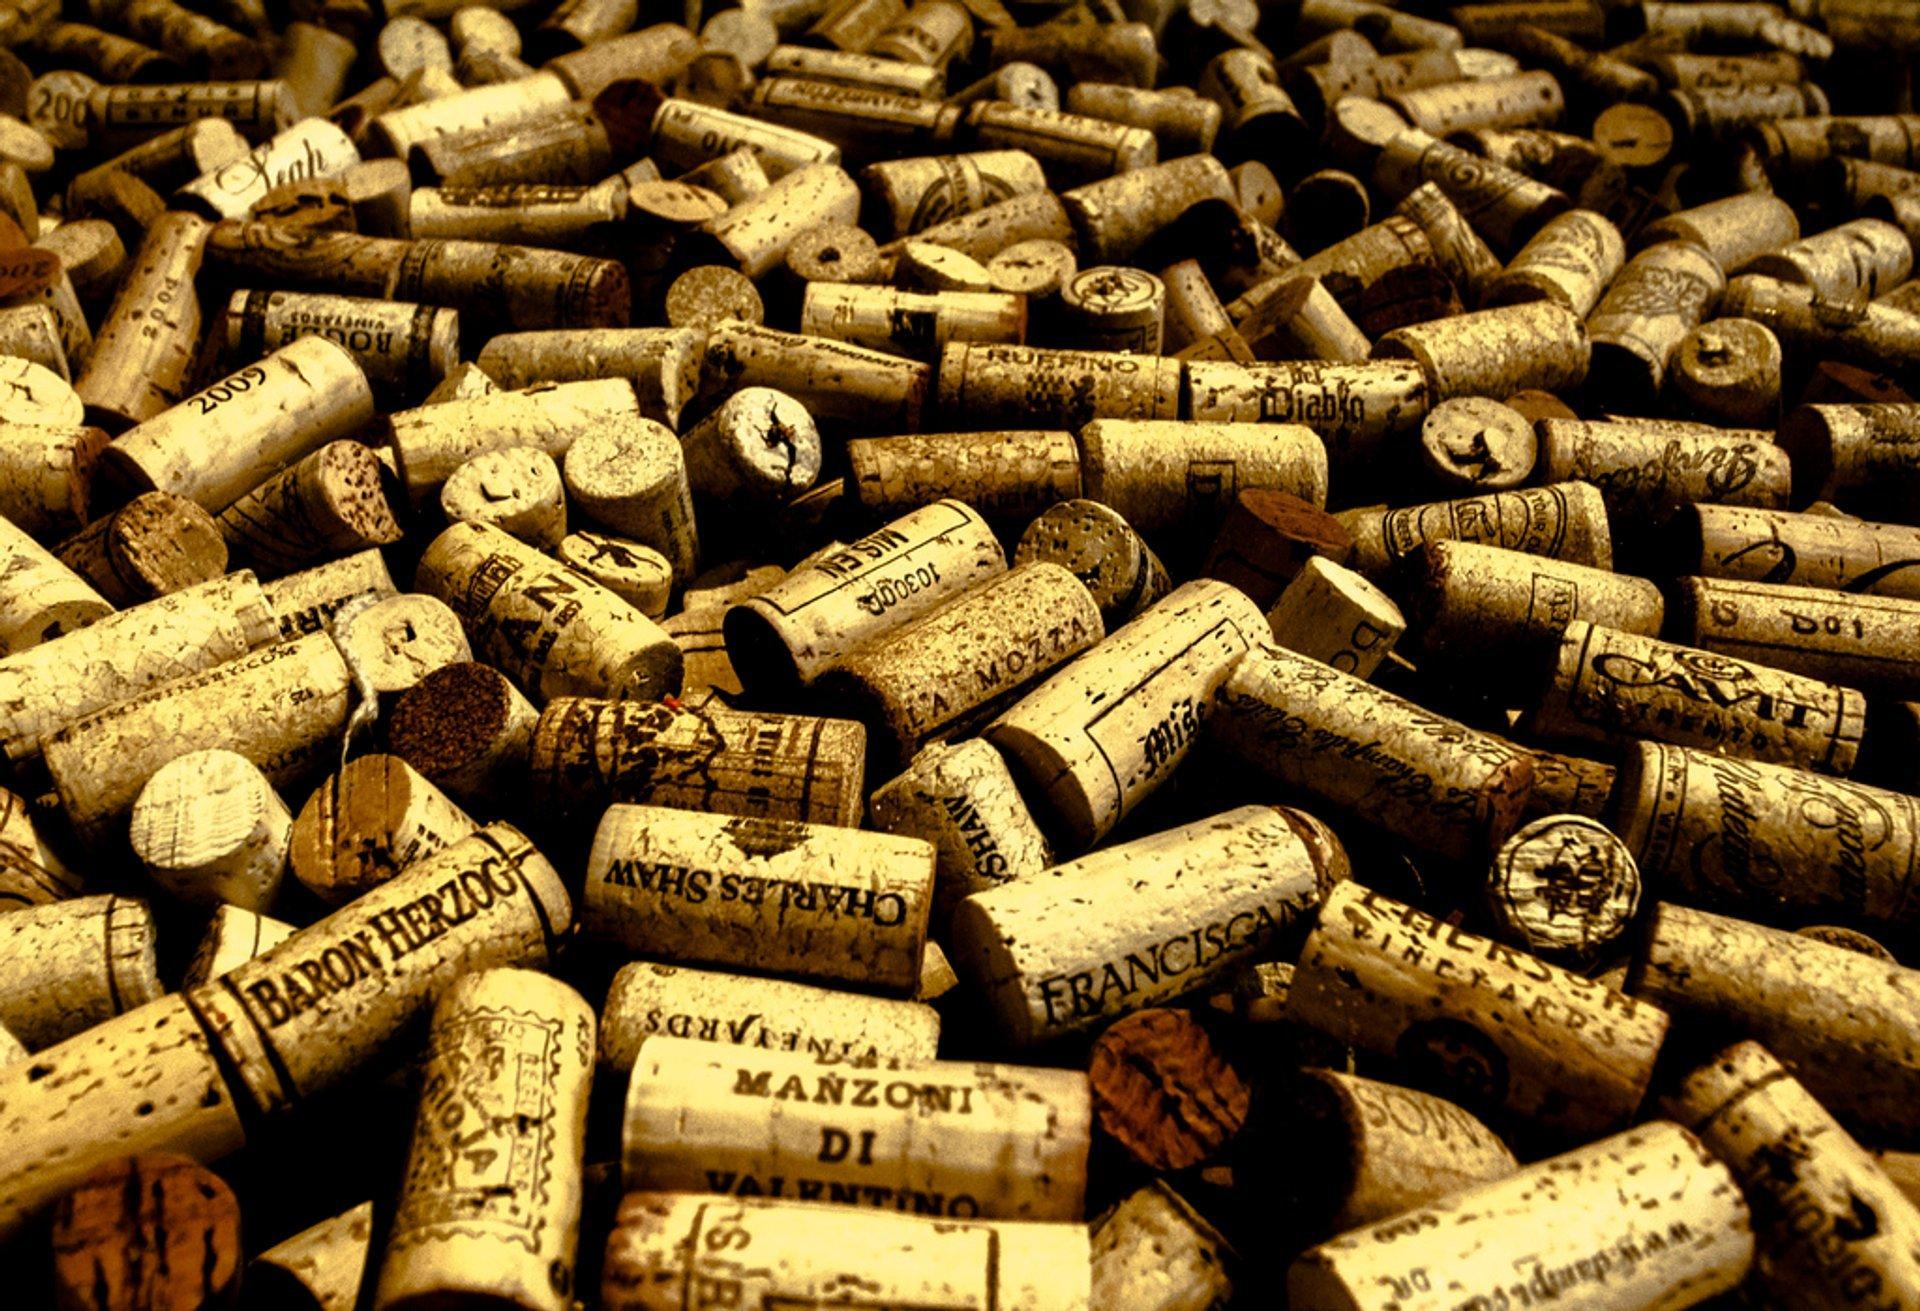 Sea of cork 2020